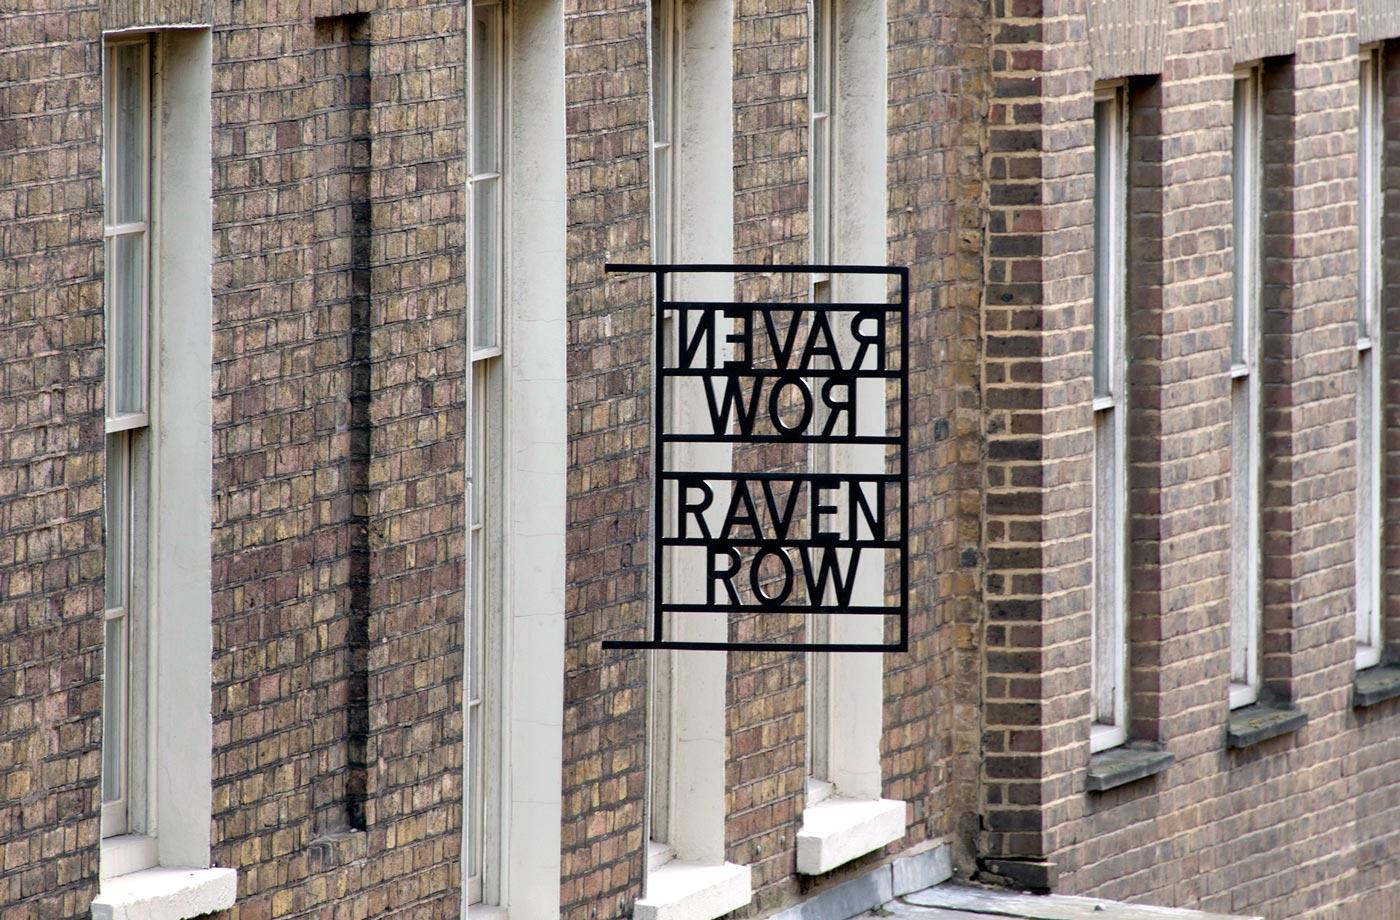 raven-row-sign-16-b